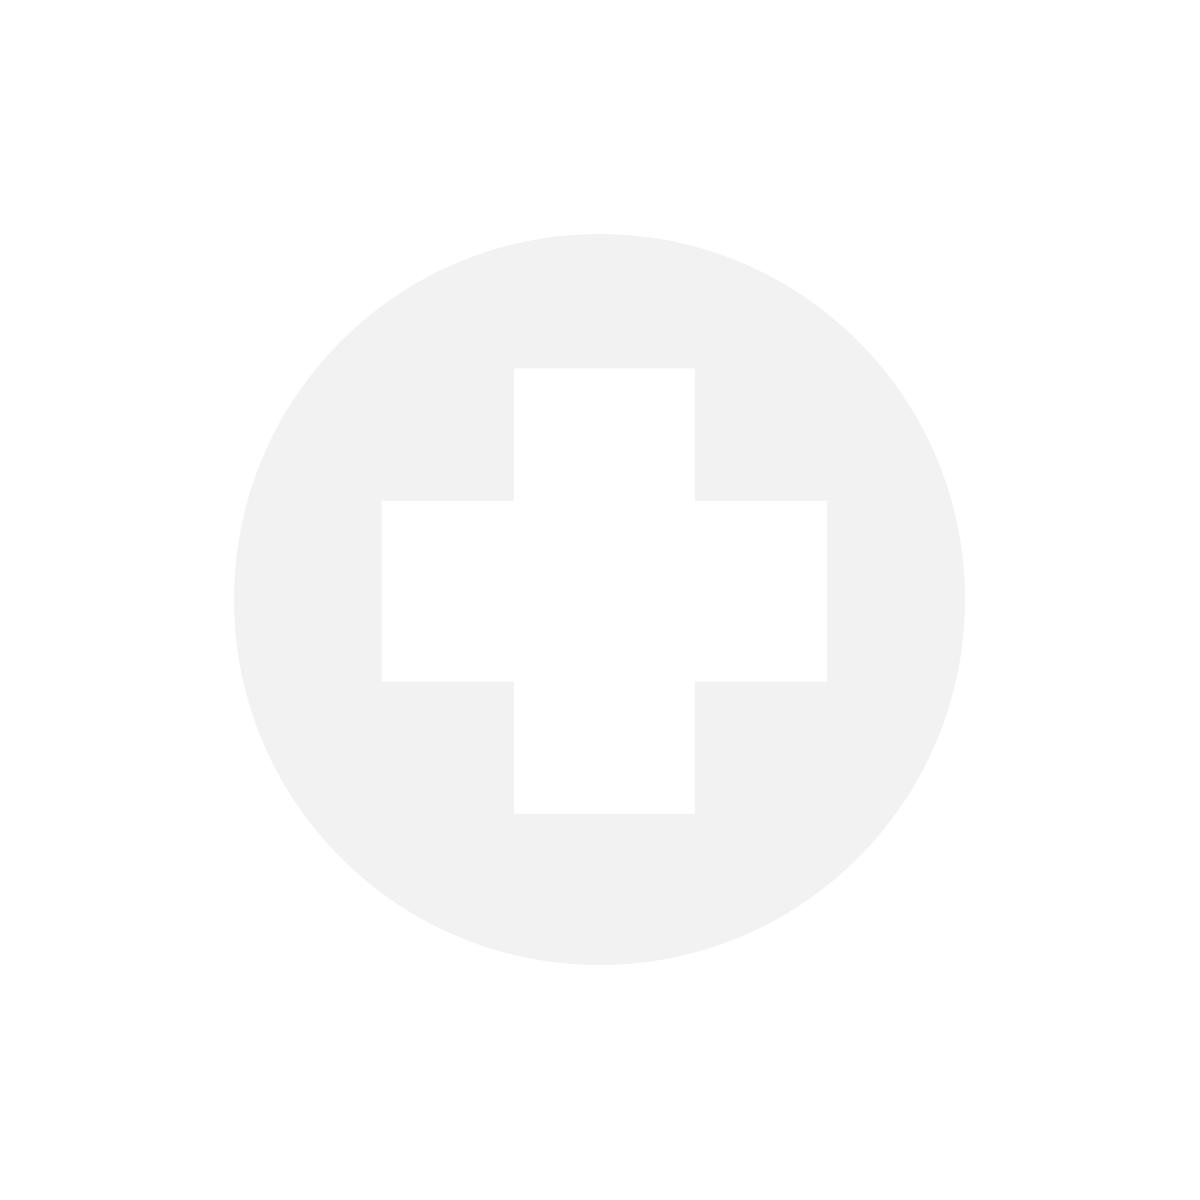 CHATTANOOGA Applicateurs avec grappe